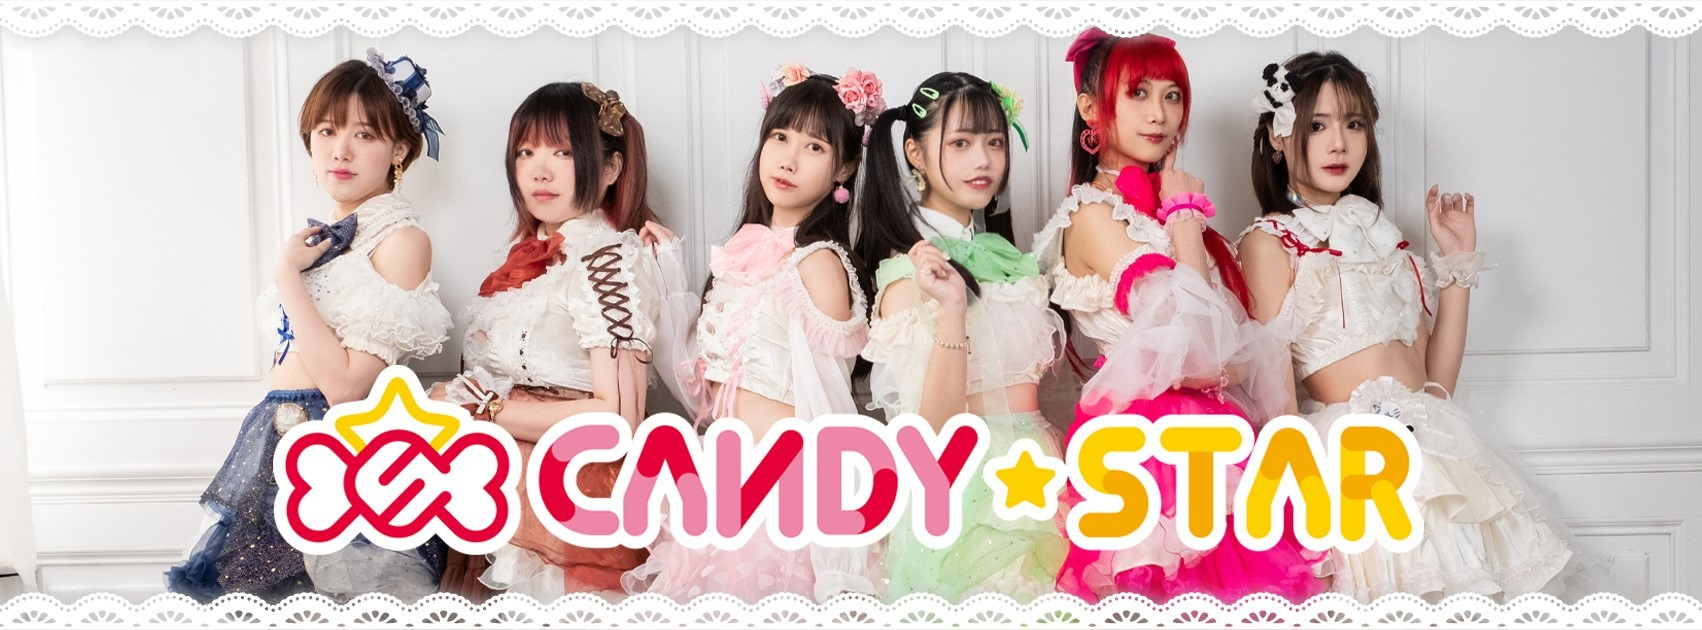 CANDY☆STAR新单曲「CANDY☆シンギュラリティ」全平台数位发行-itotii